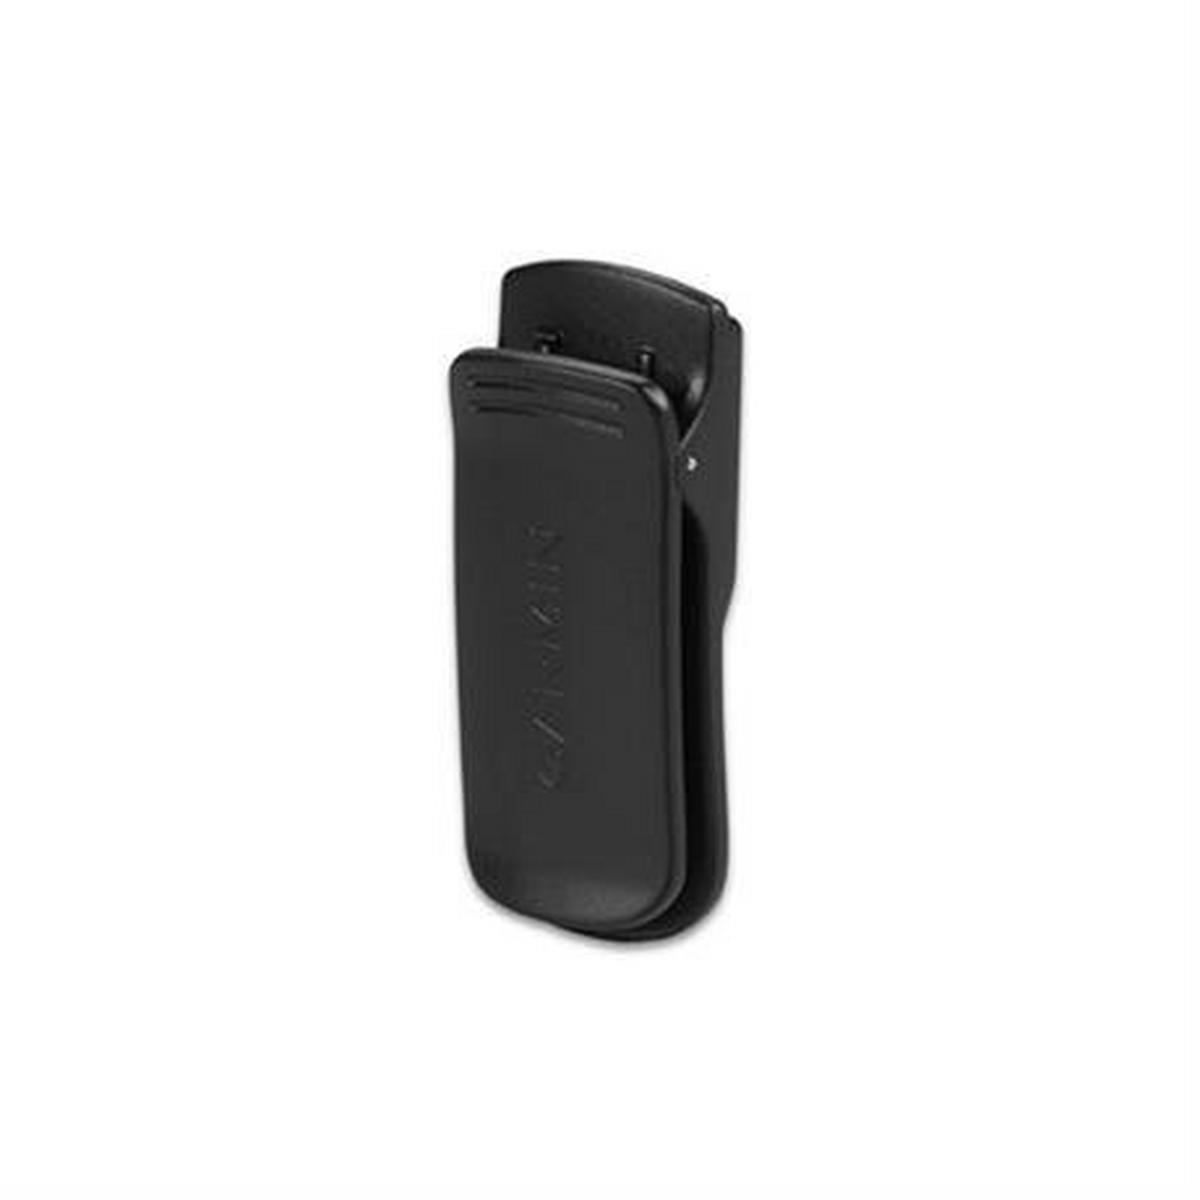 Garmin GPS Spare/Accessory: Belt Clip (Spine Mount)